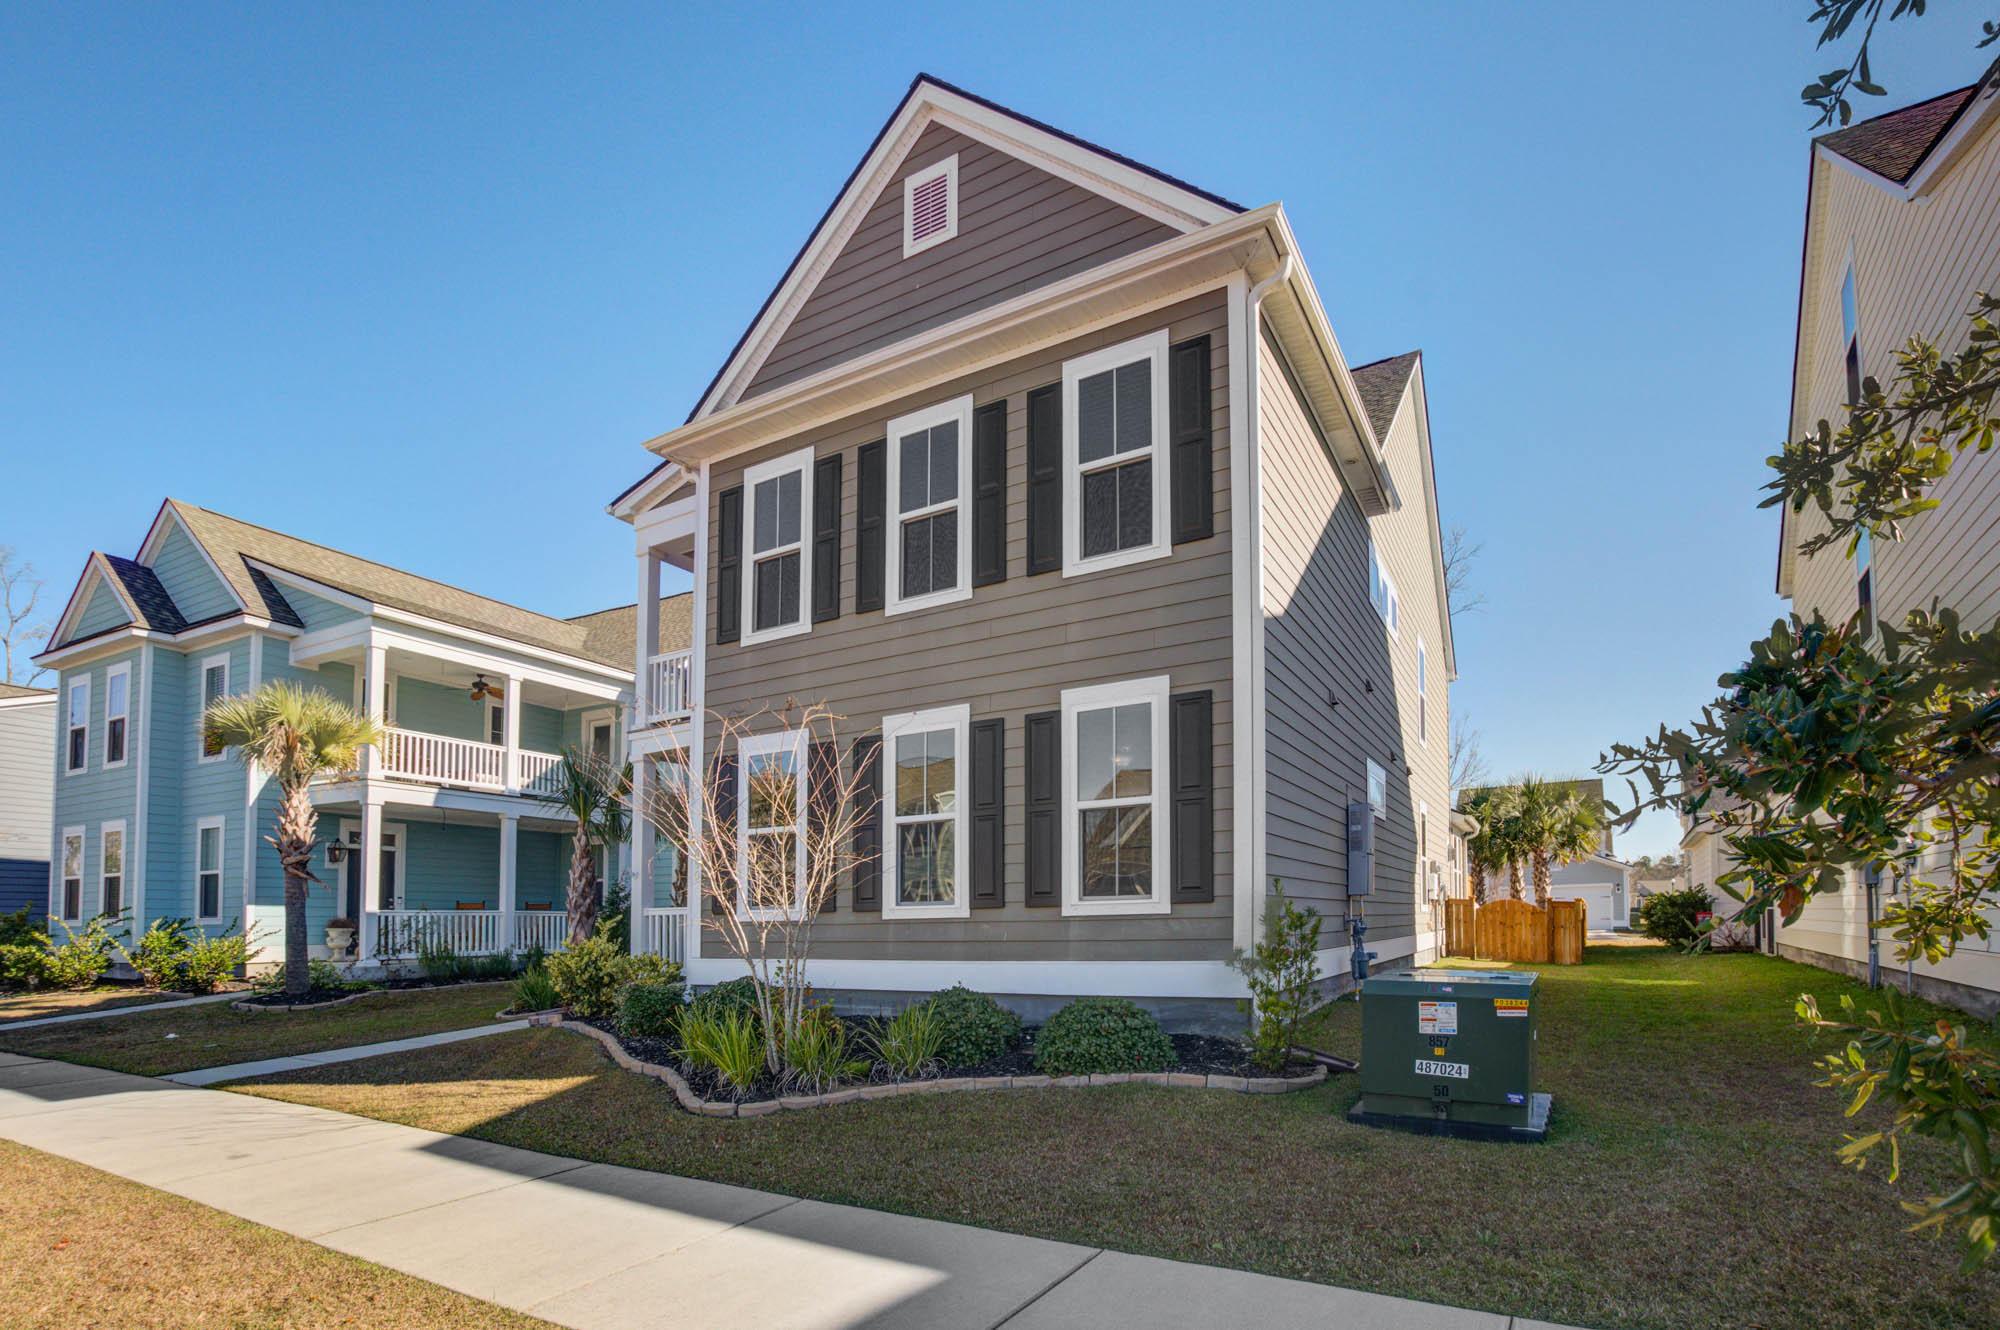 Carolina Bay Homes For Sale - 1850 Grovehurst, Charleston, SC - 7